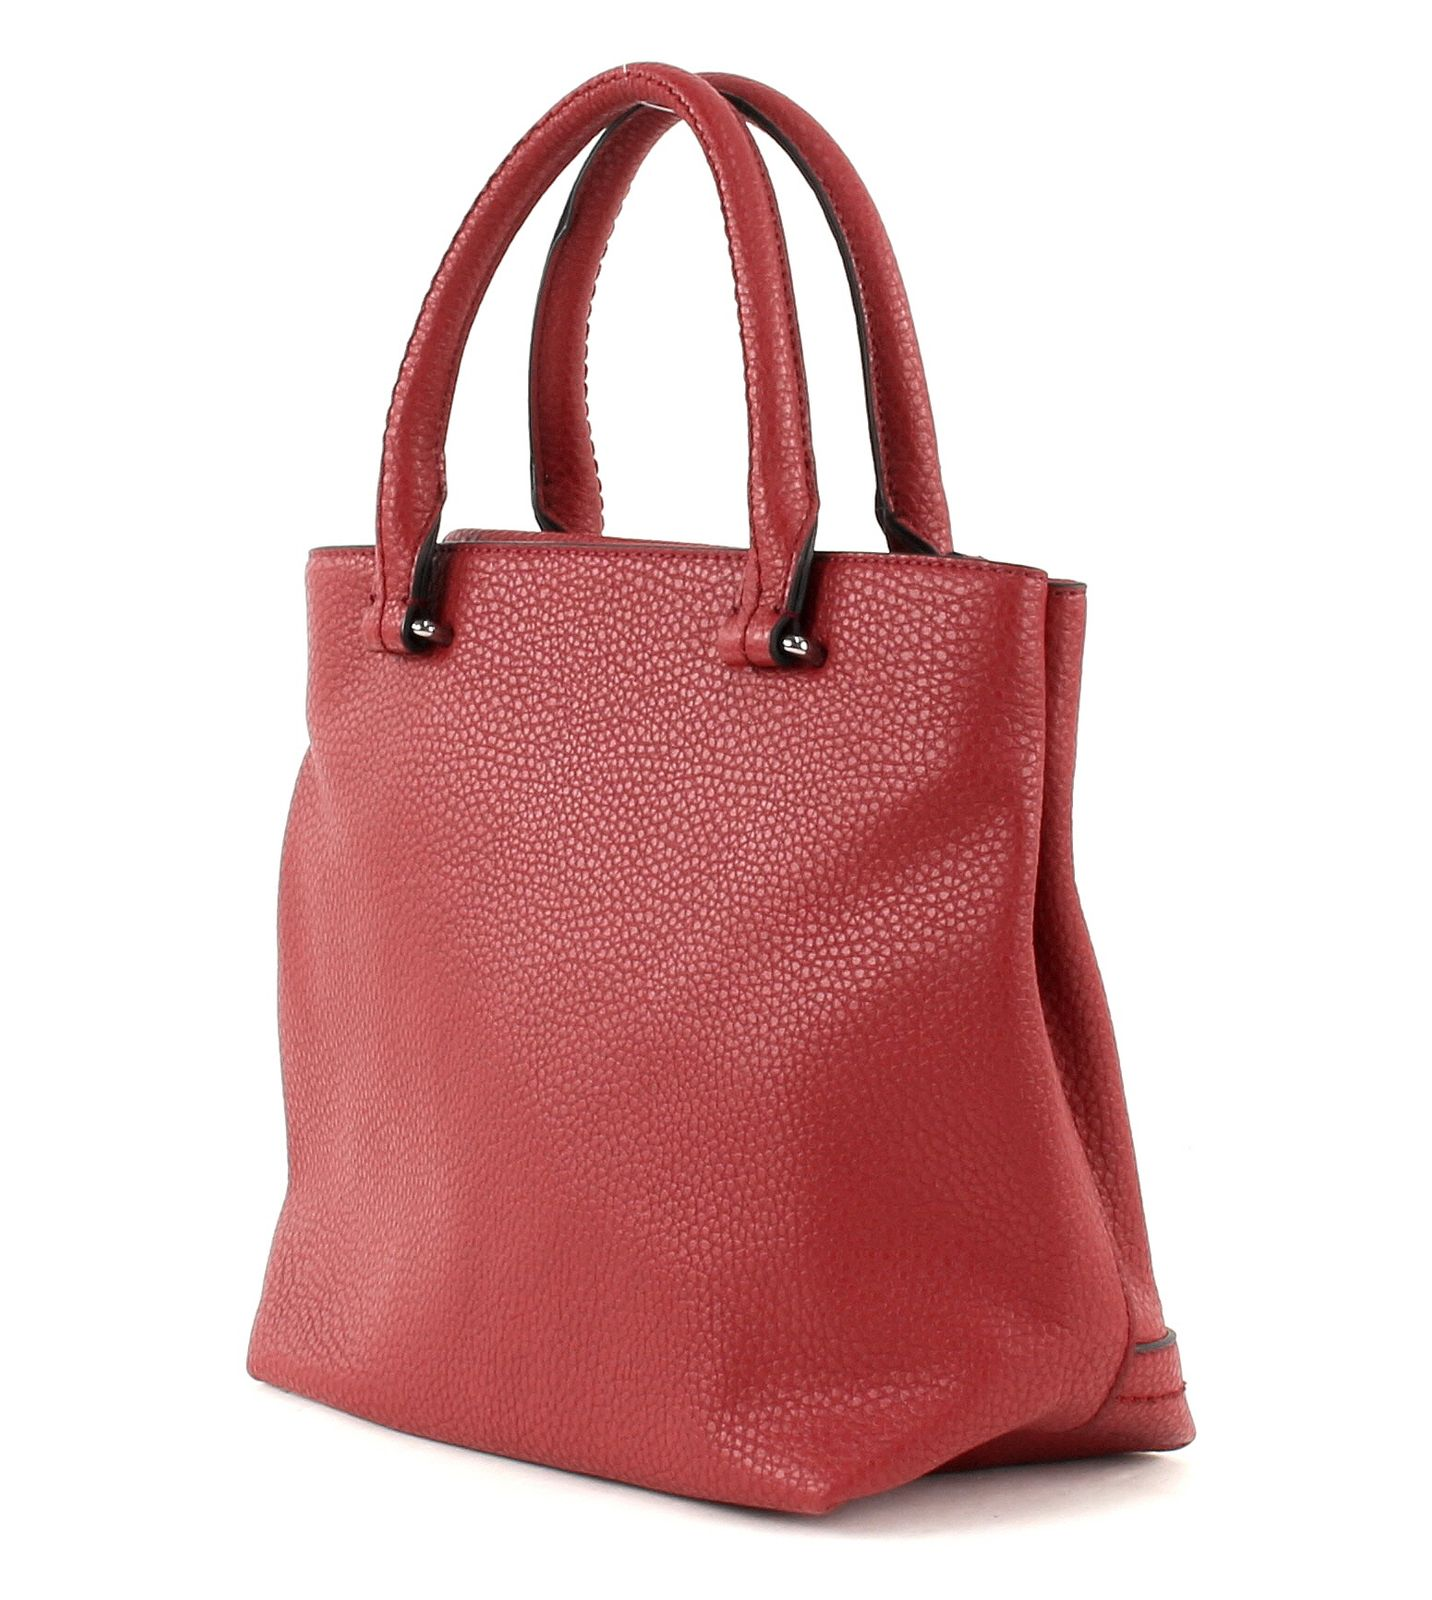 esprit katrin small city bag tasche handtasche umh ngetasche damen rot dark red ebay. Black Bedroom Furniture Sets. Home Design Ideas